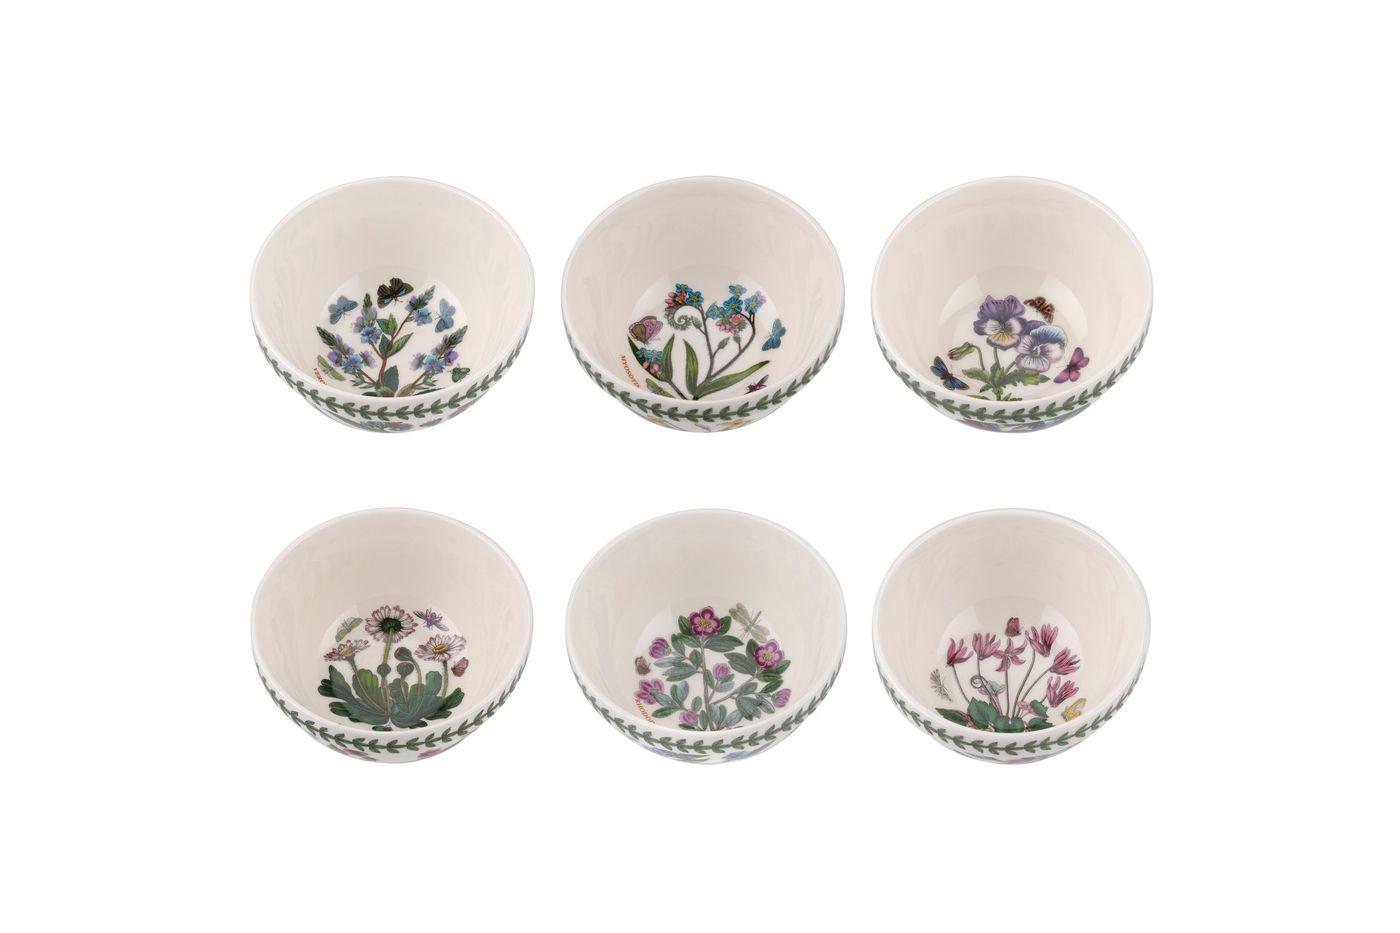 Portmeirion Botanic Garden Stacking Bowl - Set of 6 thumb 1